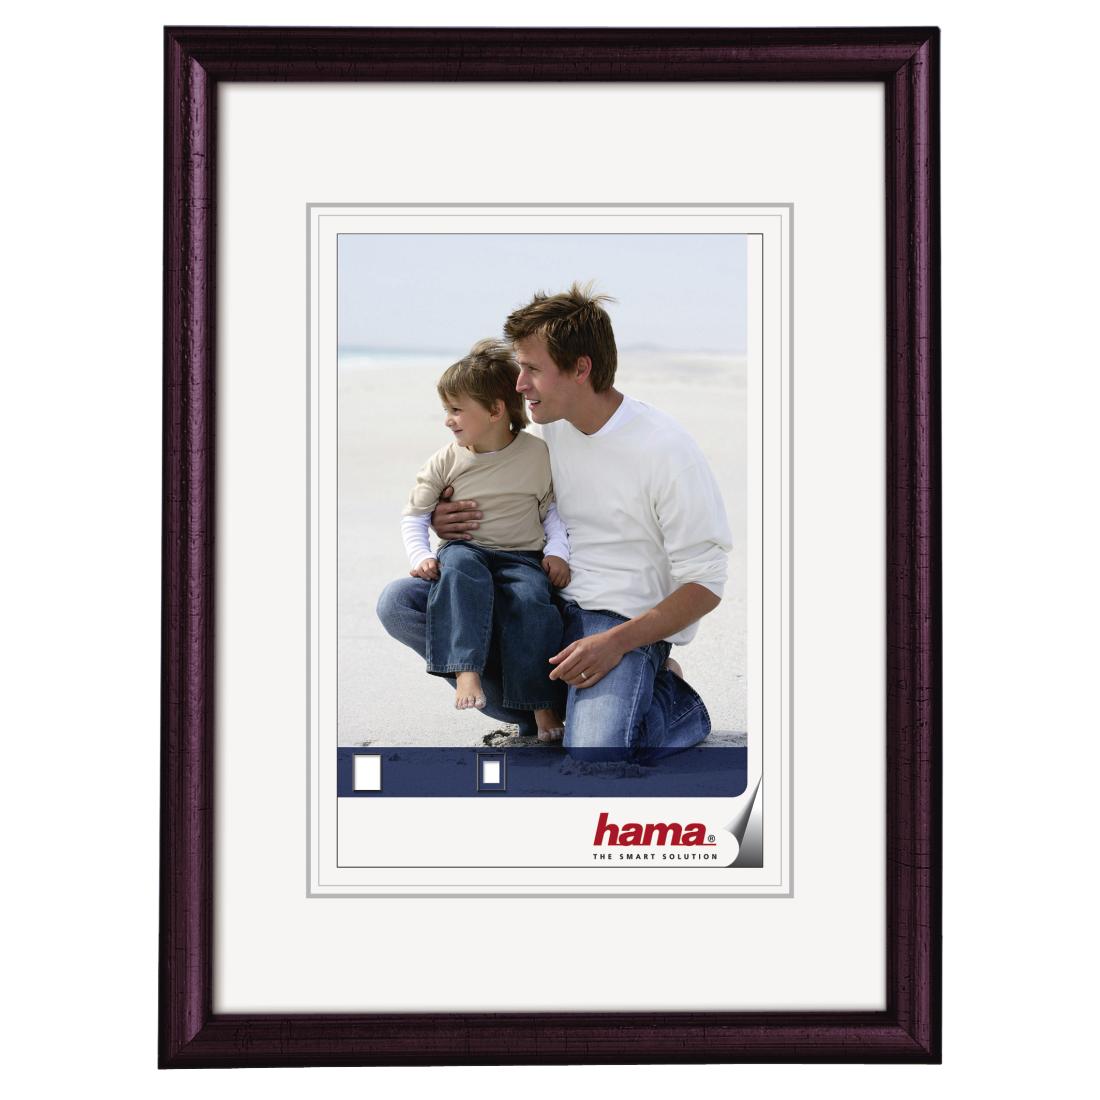 hama.com | 00064939 Hama Holzrahmen \